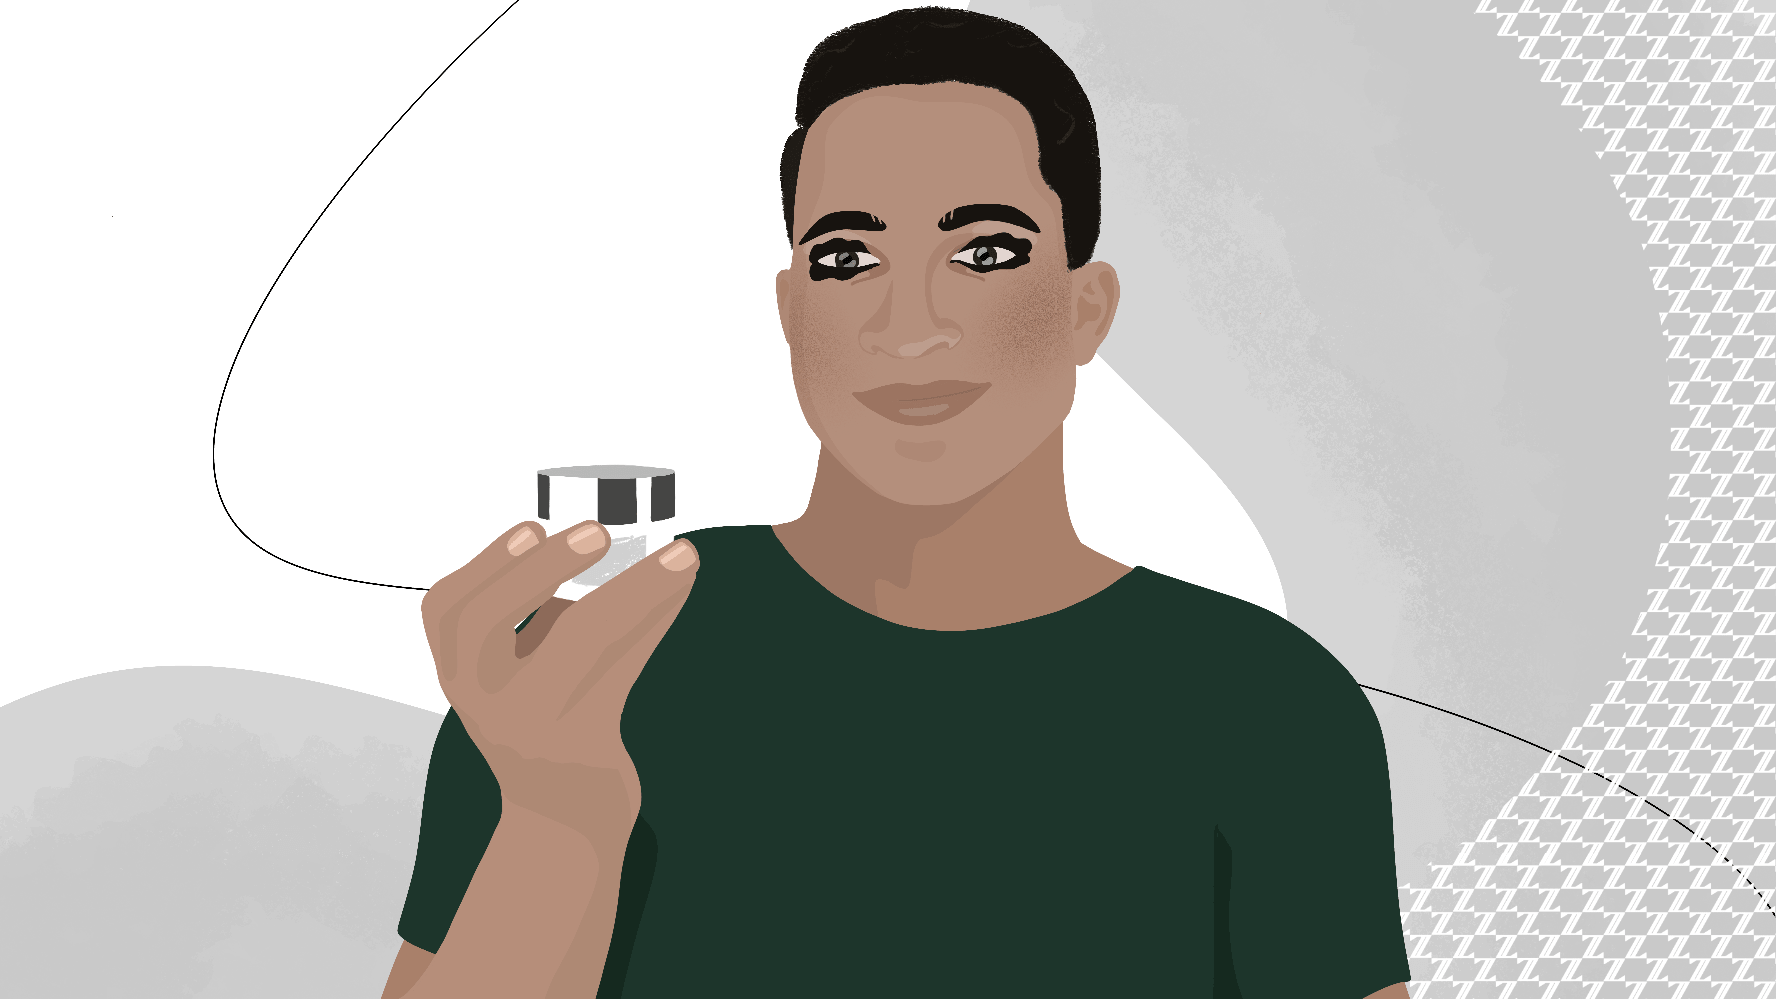 Products that address men's skin characteristics